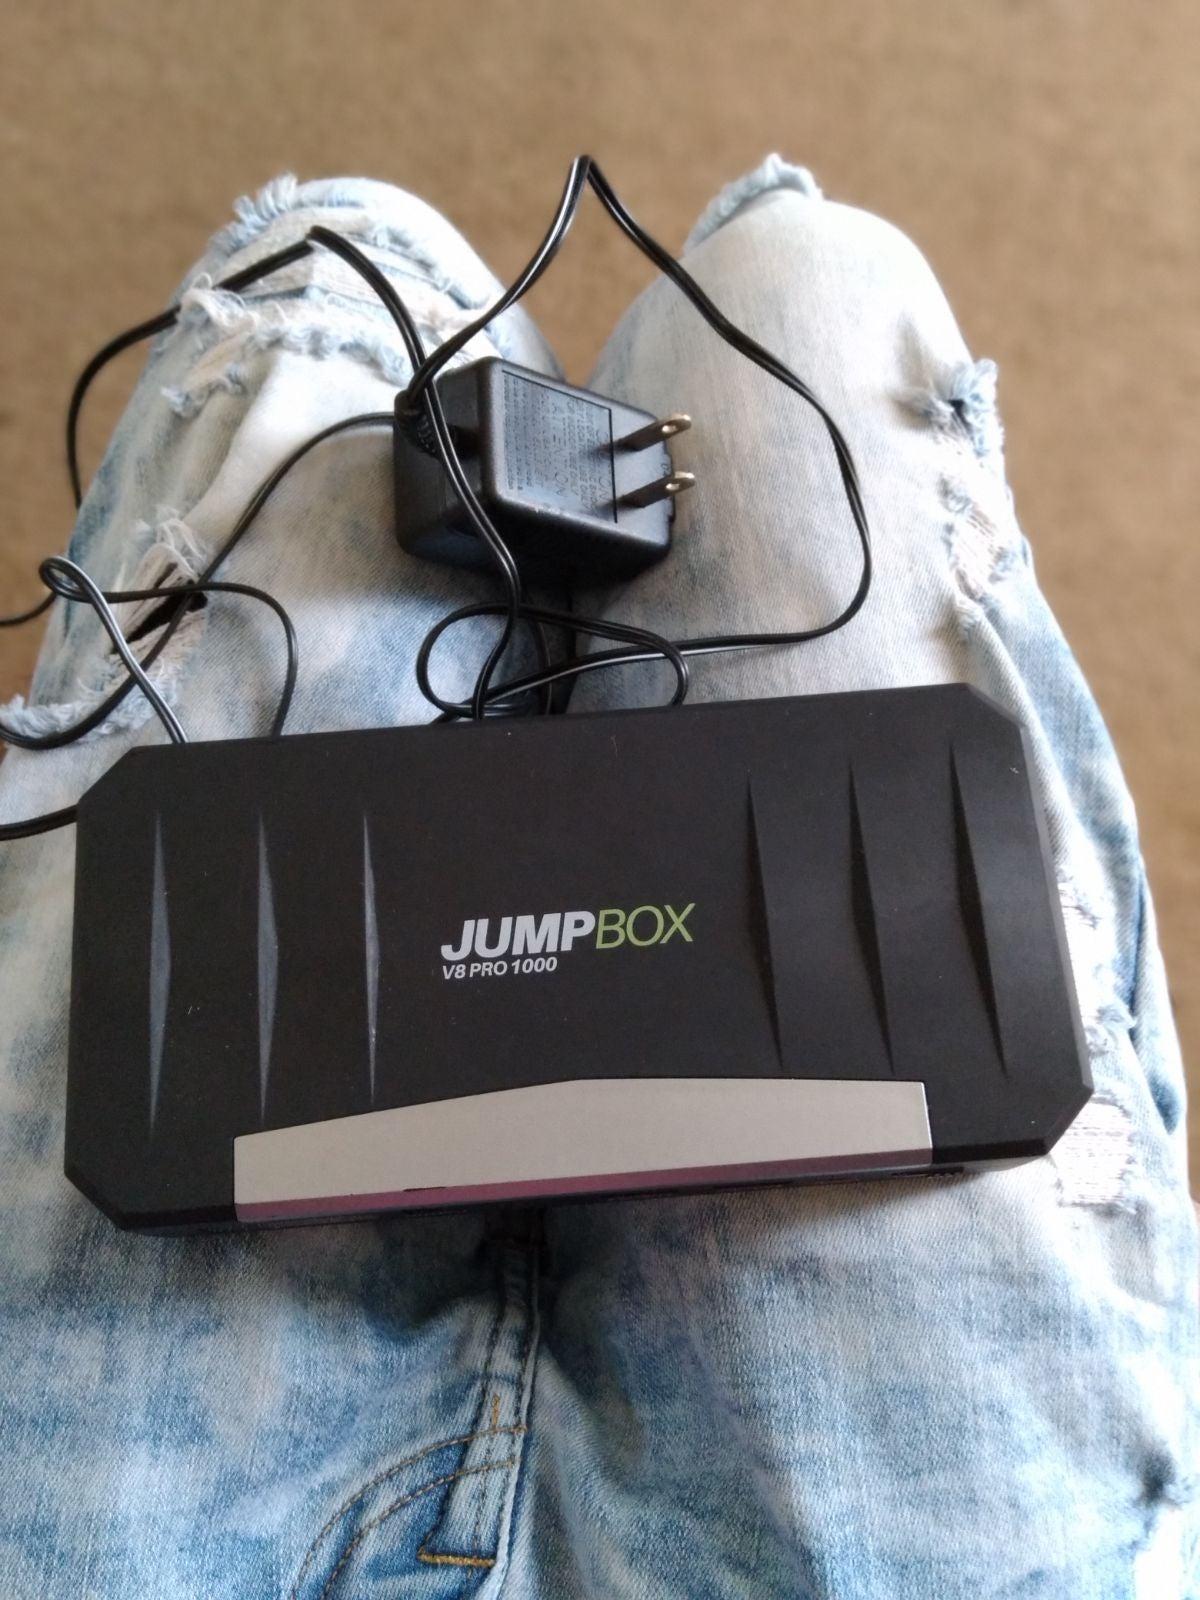 Jumpbox V8 Pro 1000